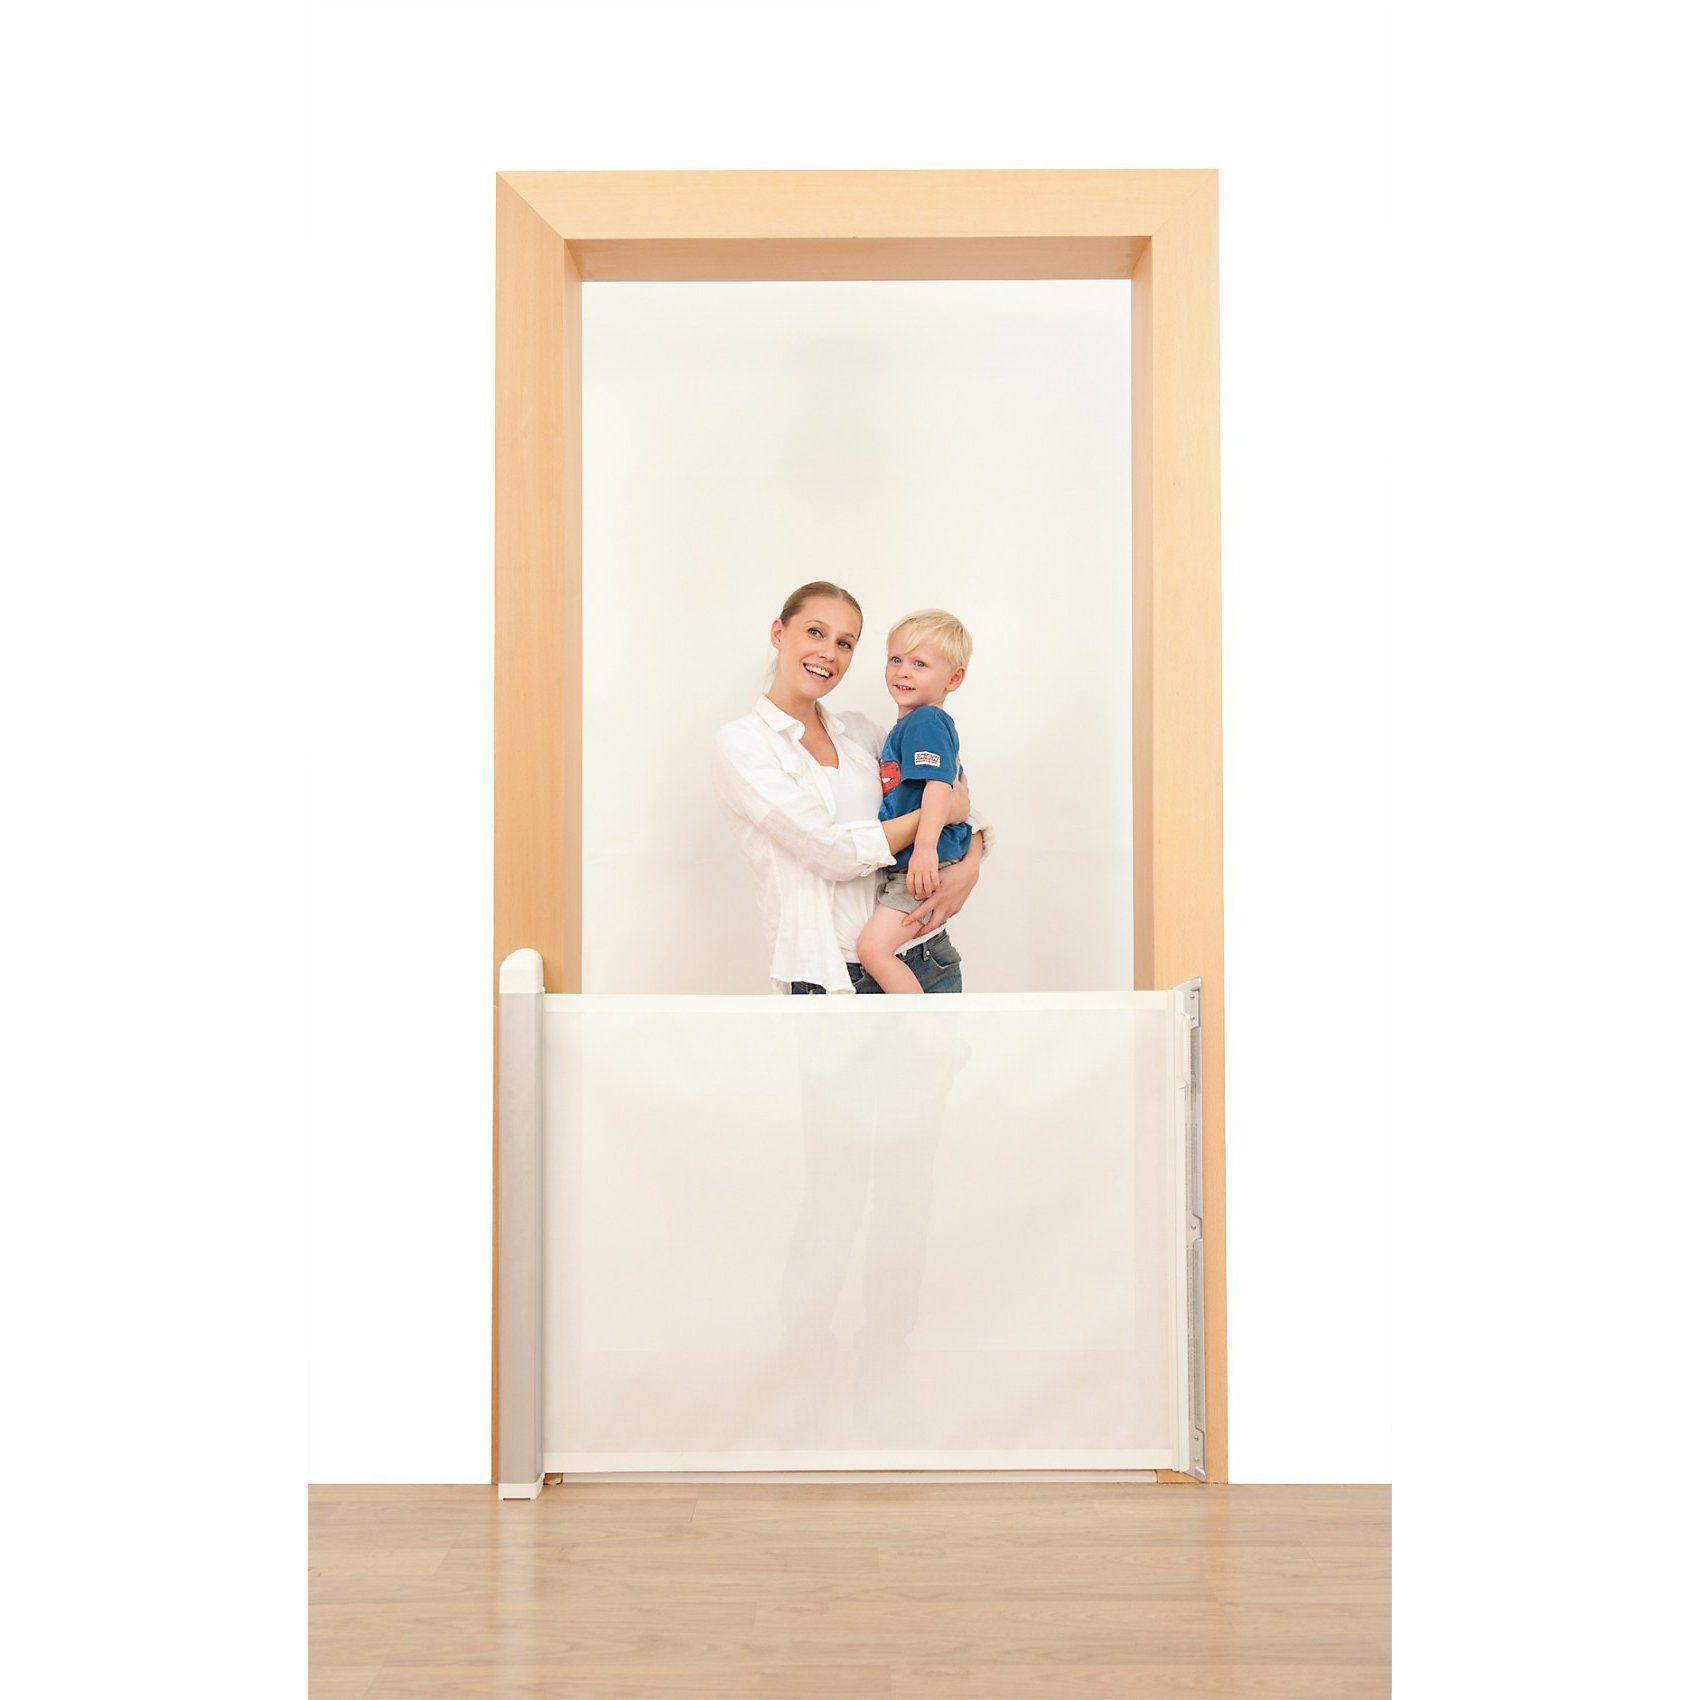 Lascal Tür- und Treppenschutzgitter KiddyGuard avant, weiß